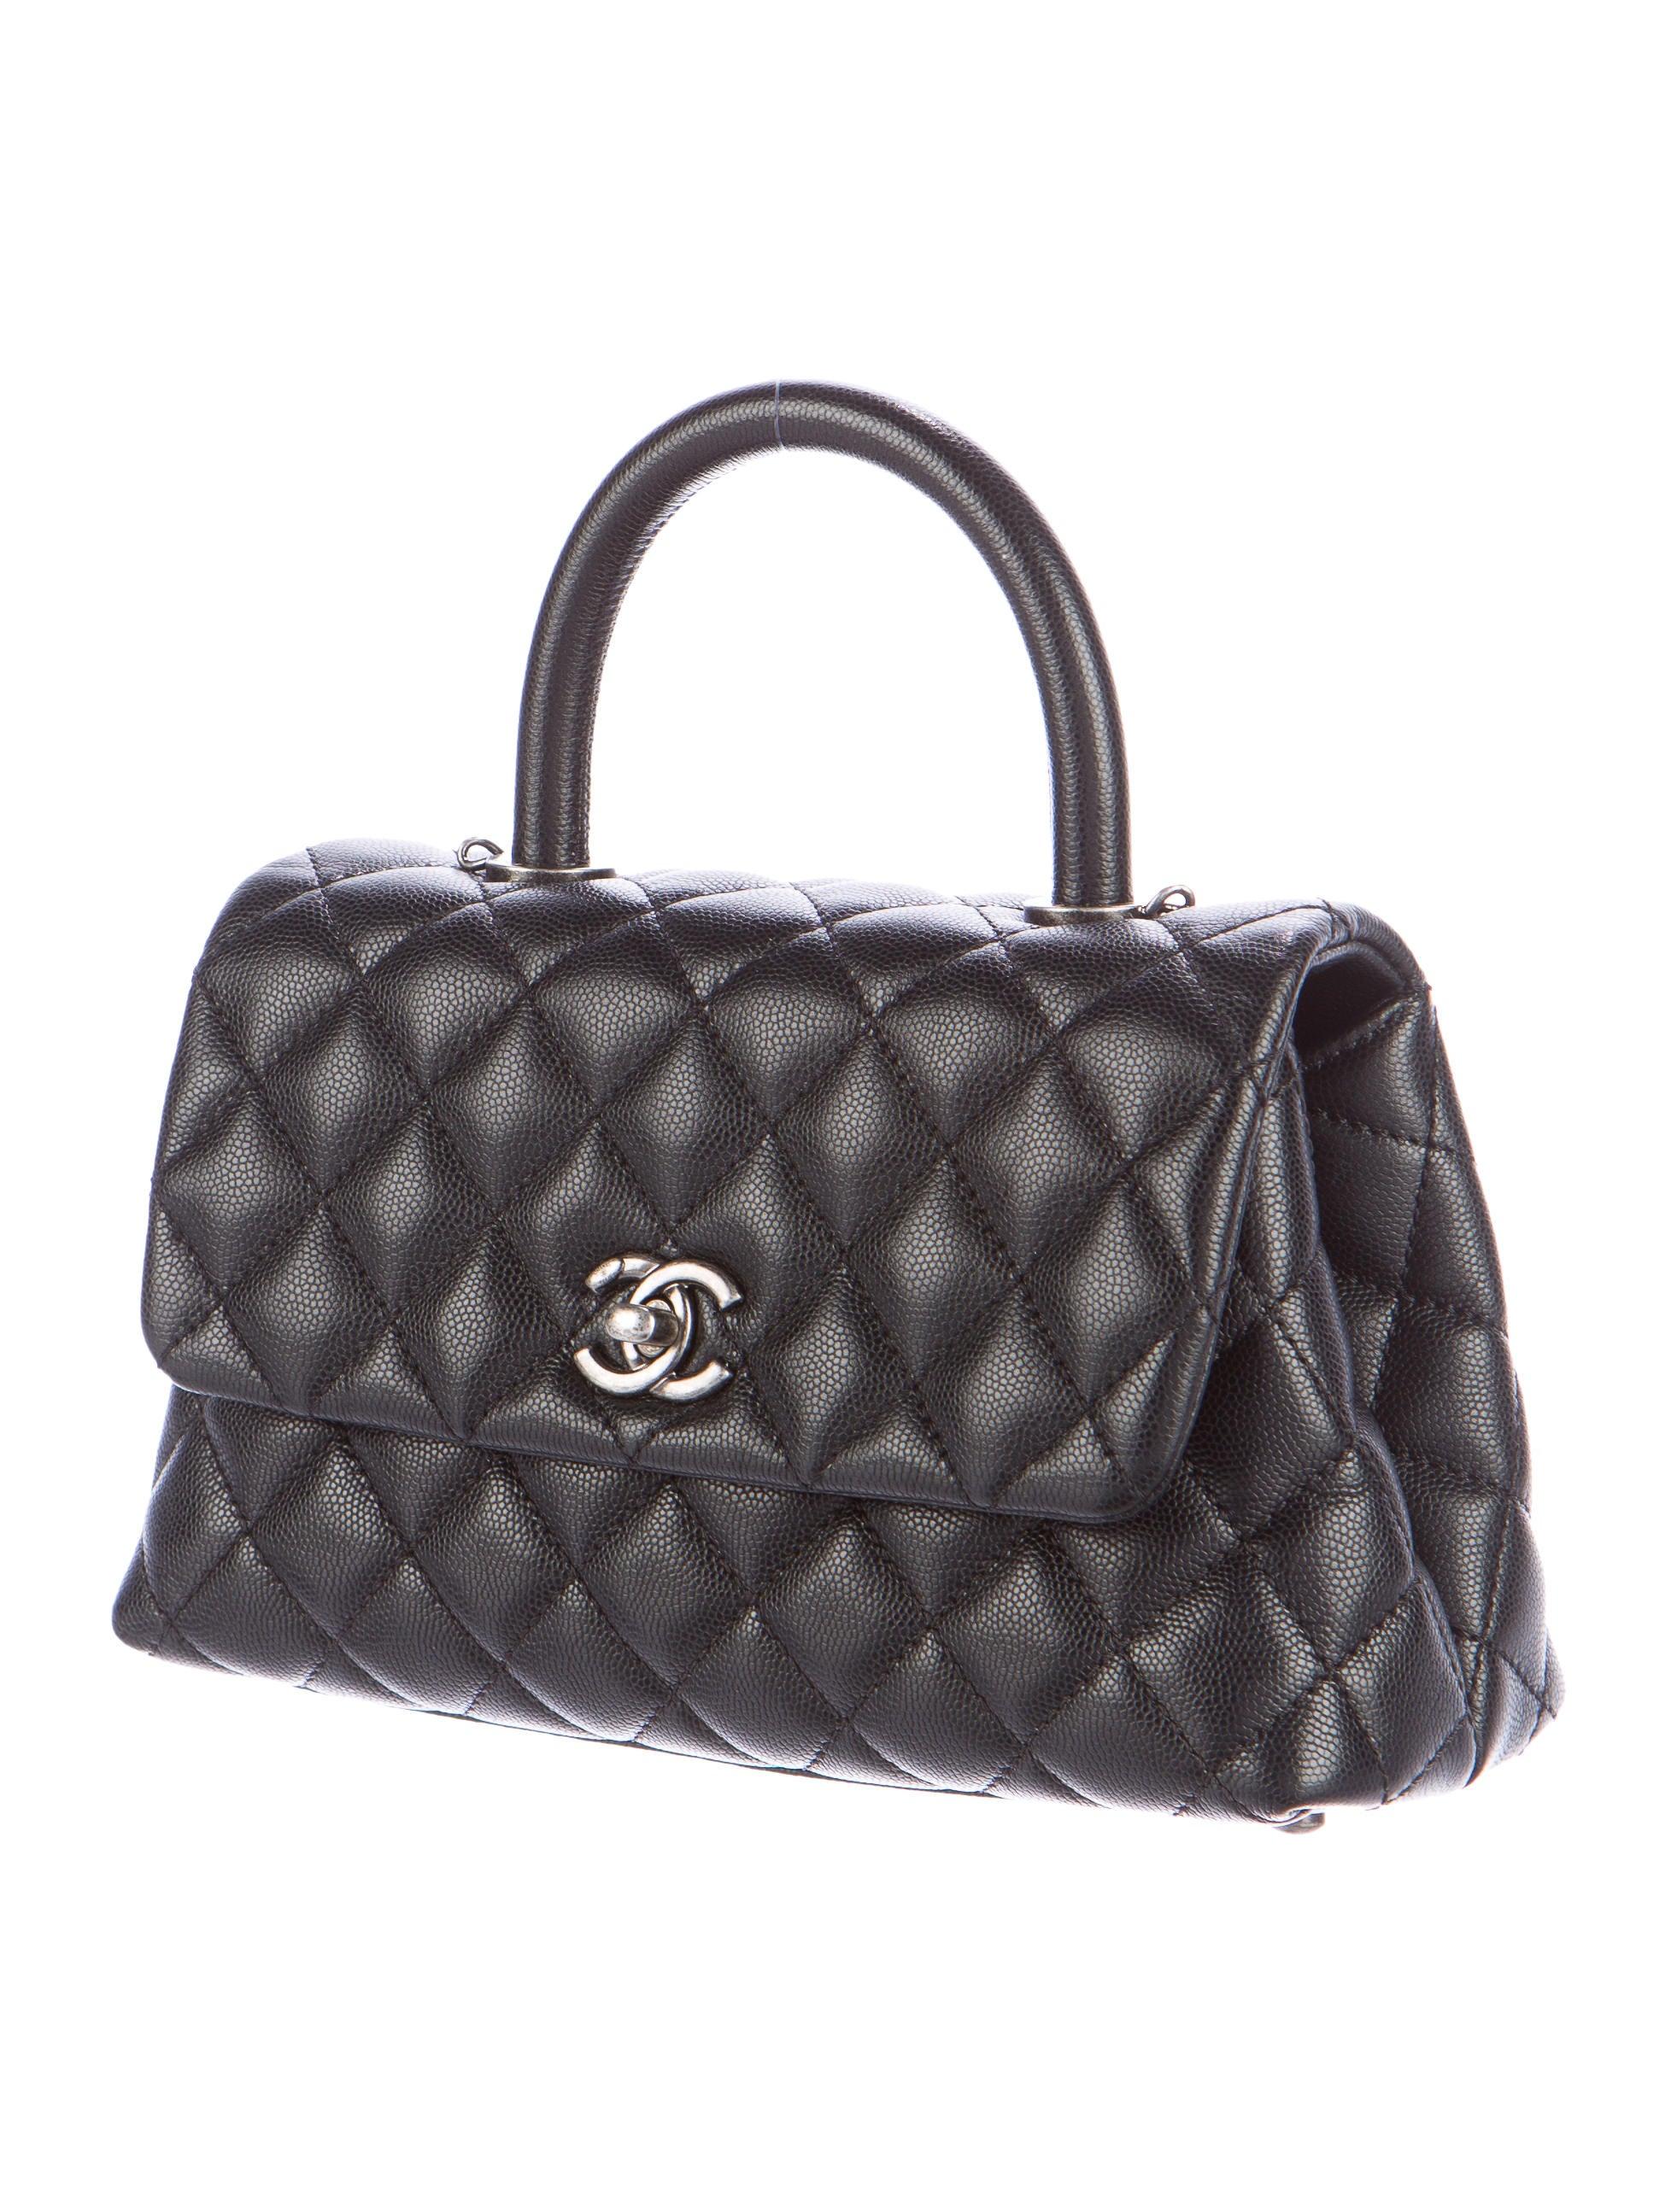 Chanel 2016 Mini Coco Handle Bag Handbags CHA138846  : CHA1388463enlarged from www.therealreal.com size 1963 x 2590 jpeg 461kB